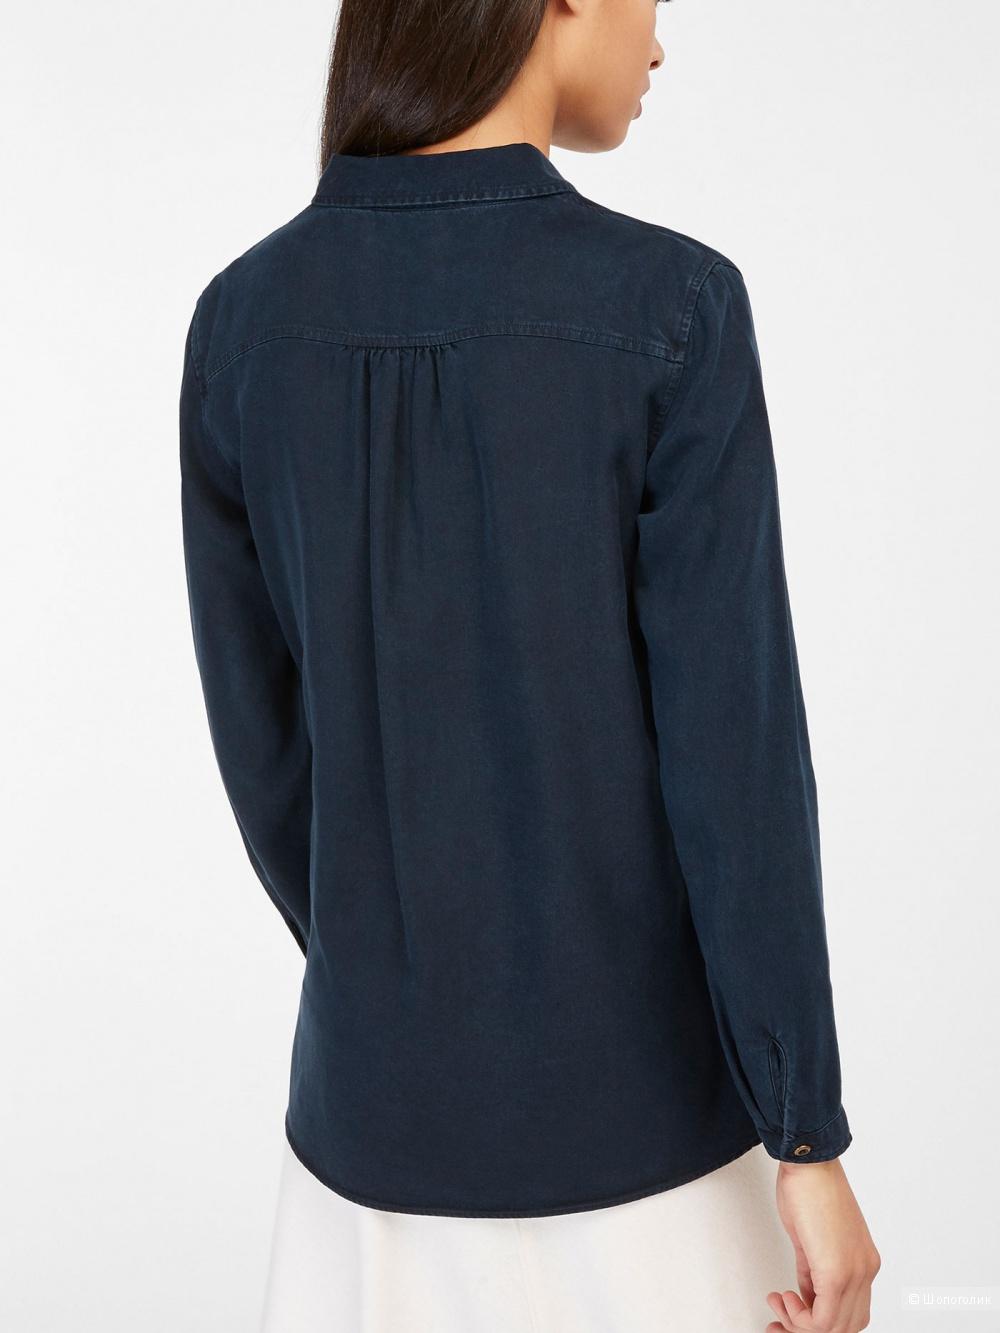 Massimo Dutti рубашка блузка размер 36